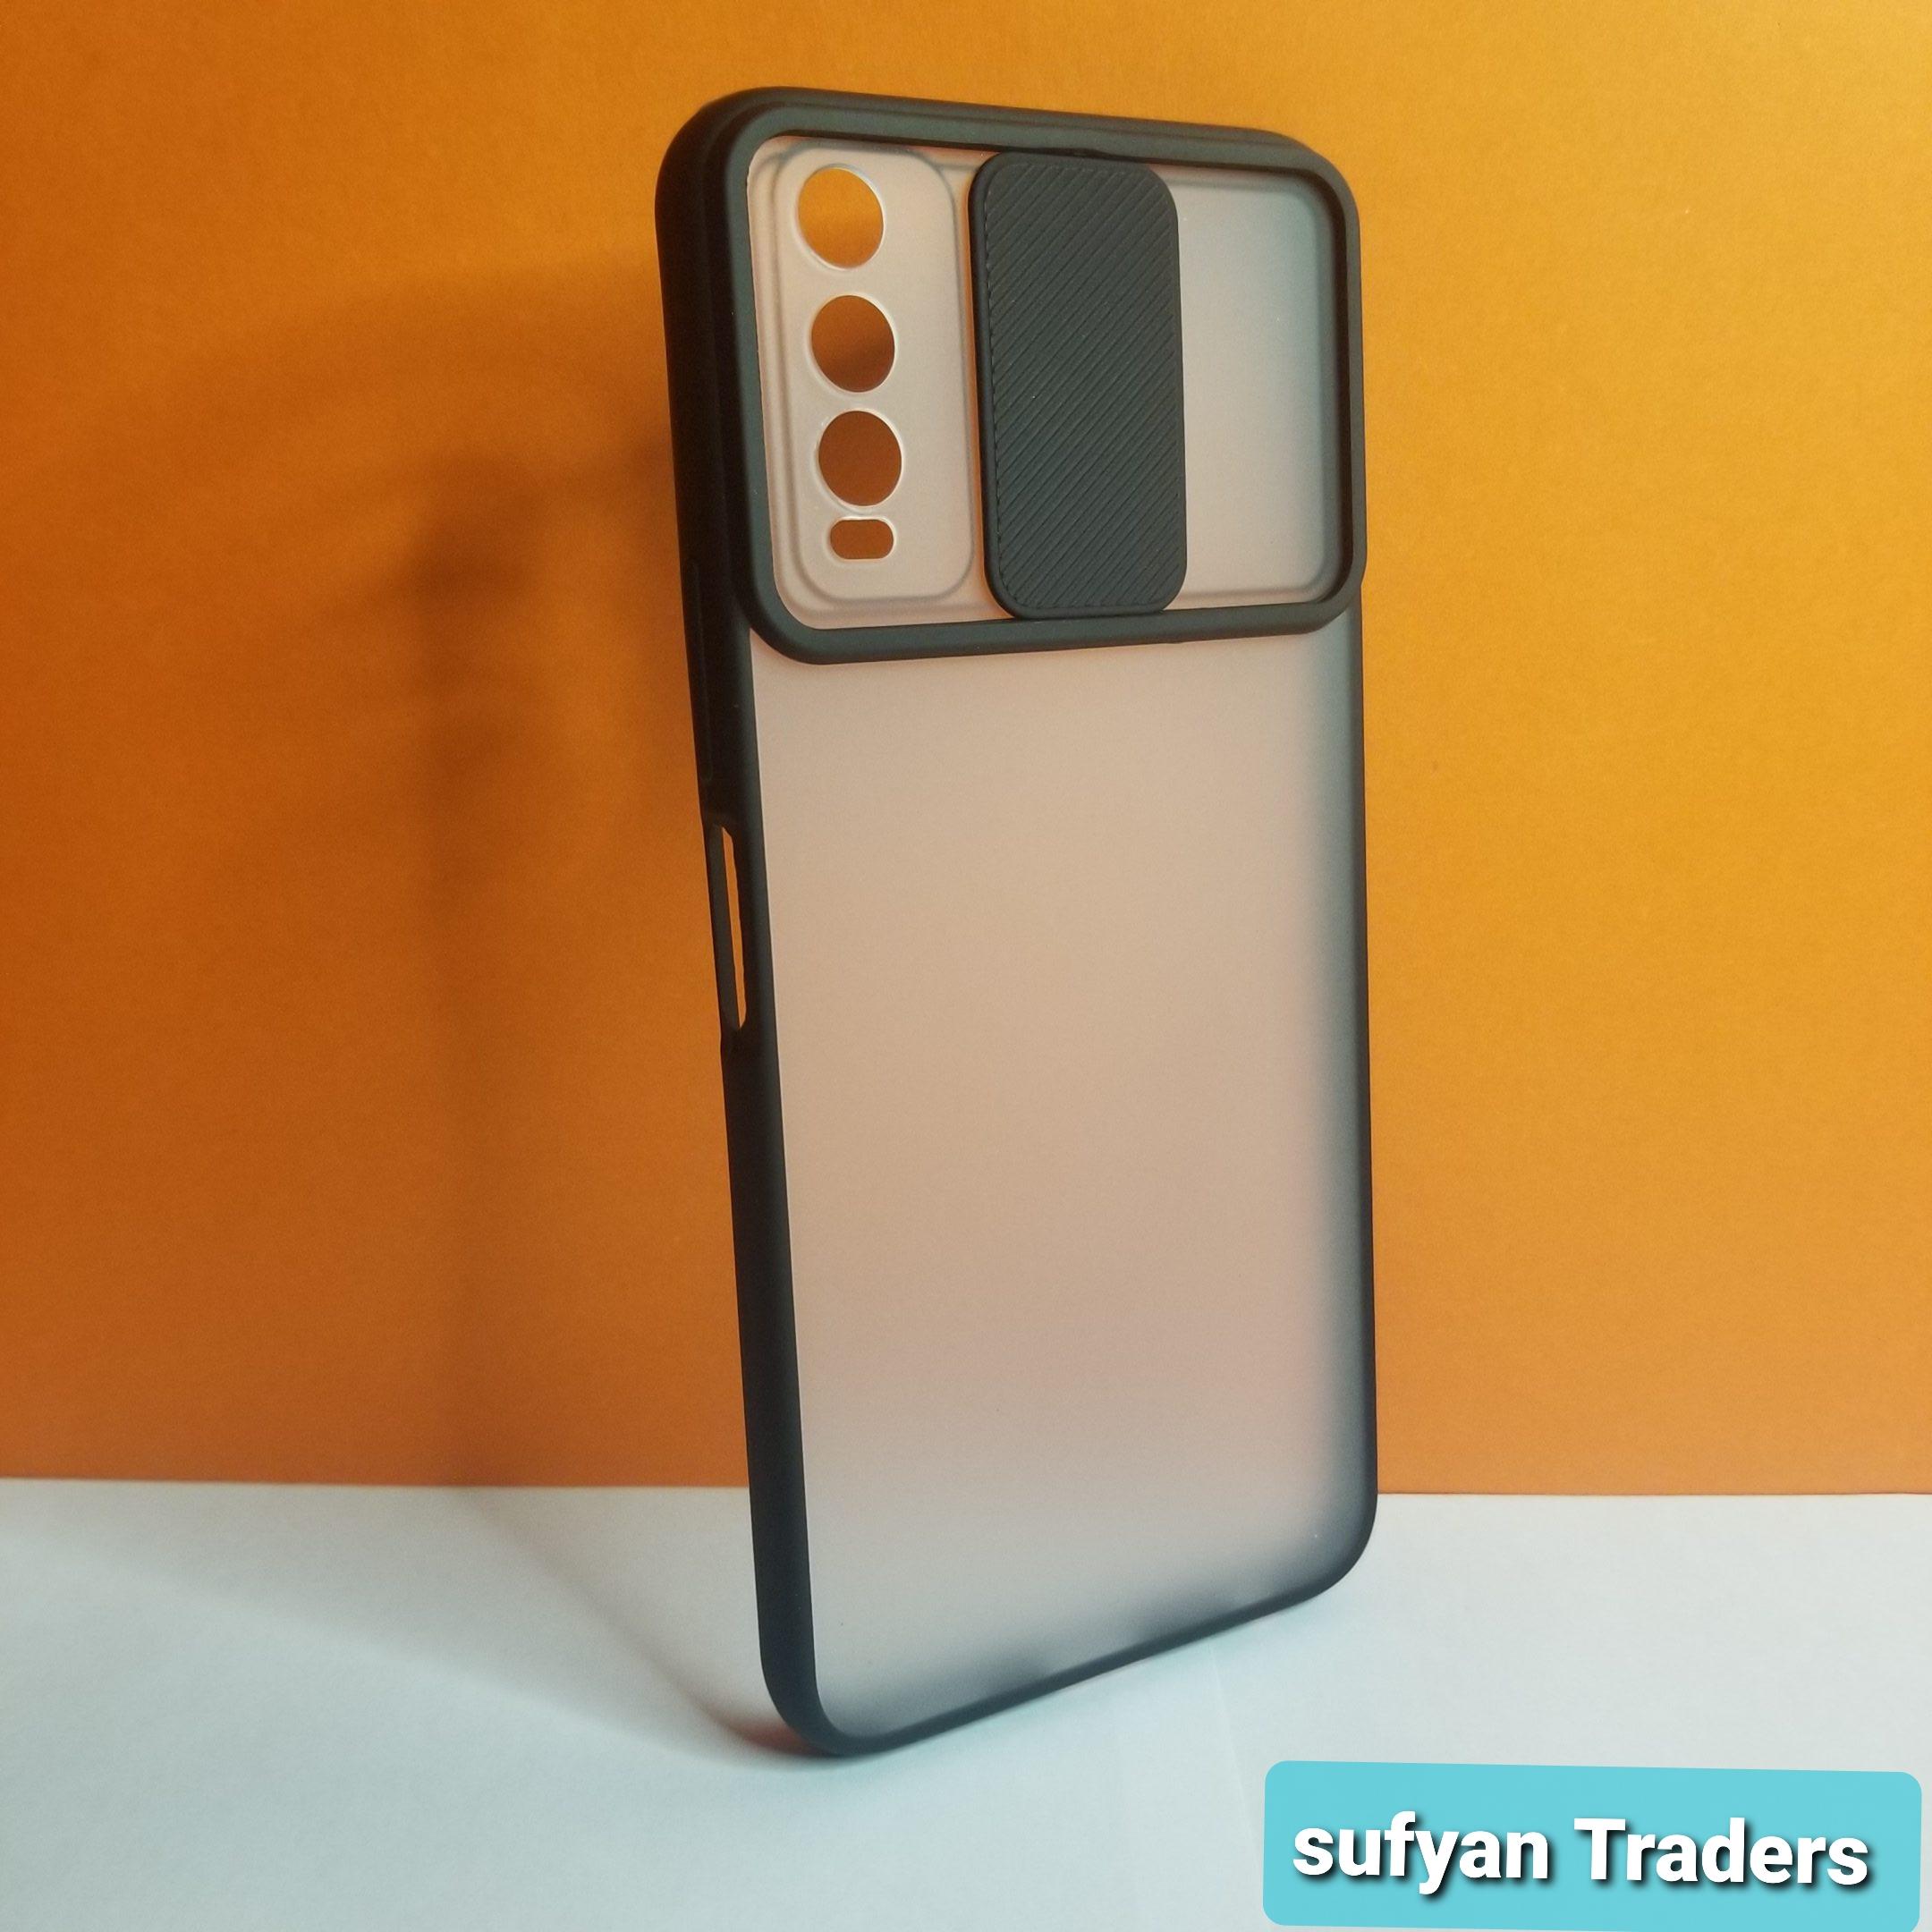 vivo_Y20 window slide camera protection matte back cover case Premium Luxury Highest Quality for vivo_ y20